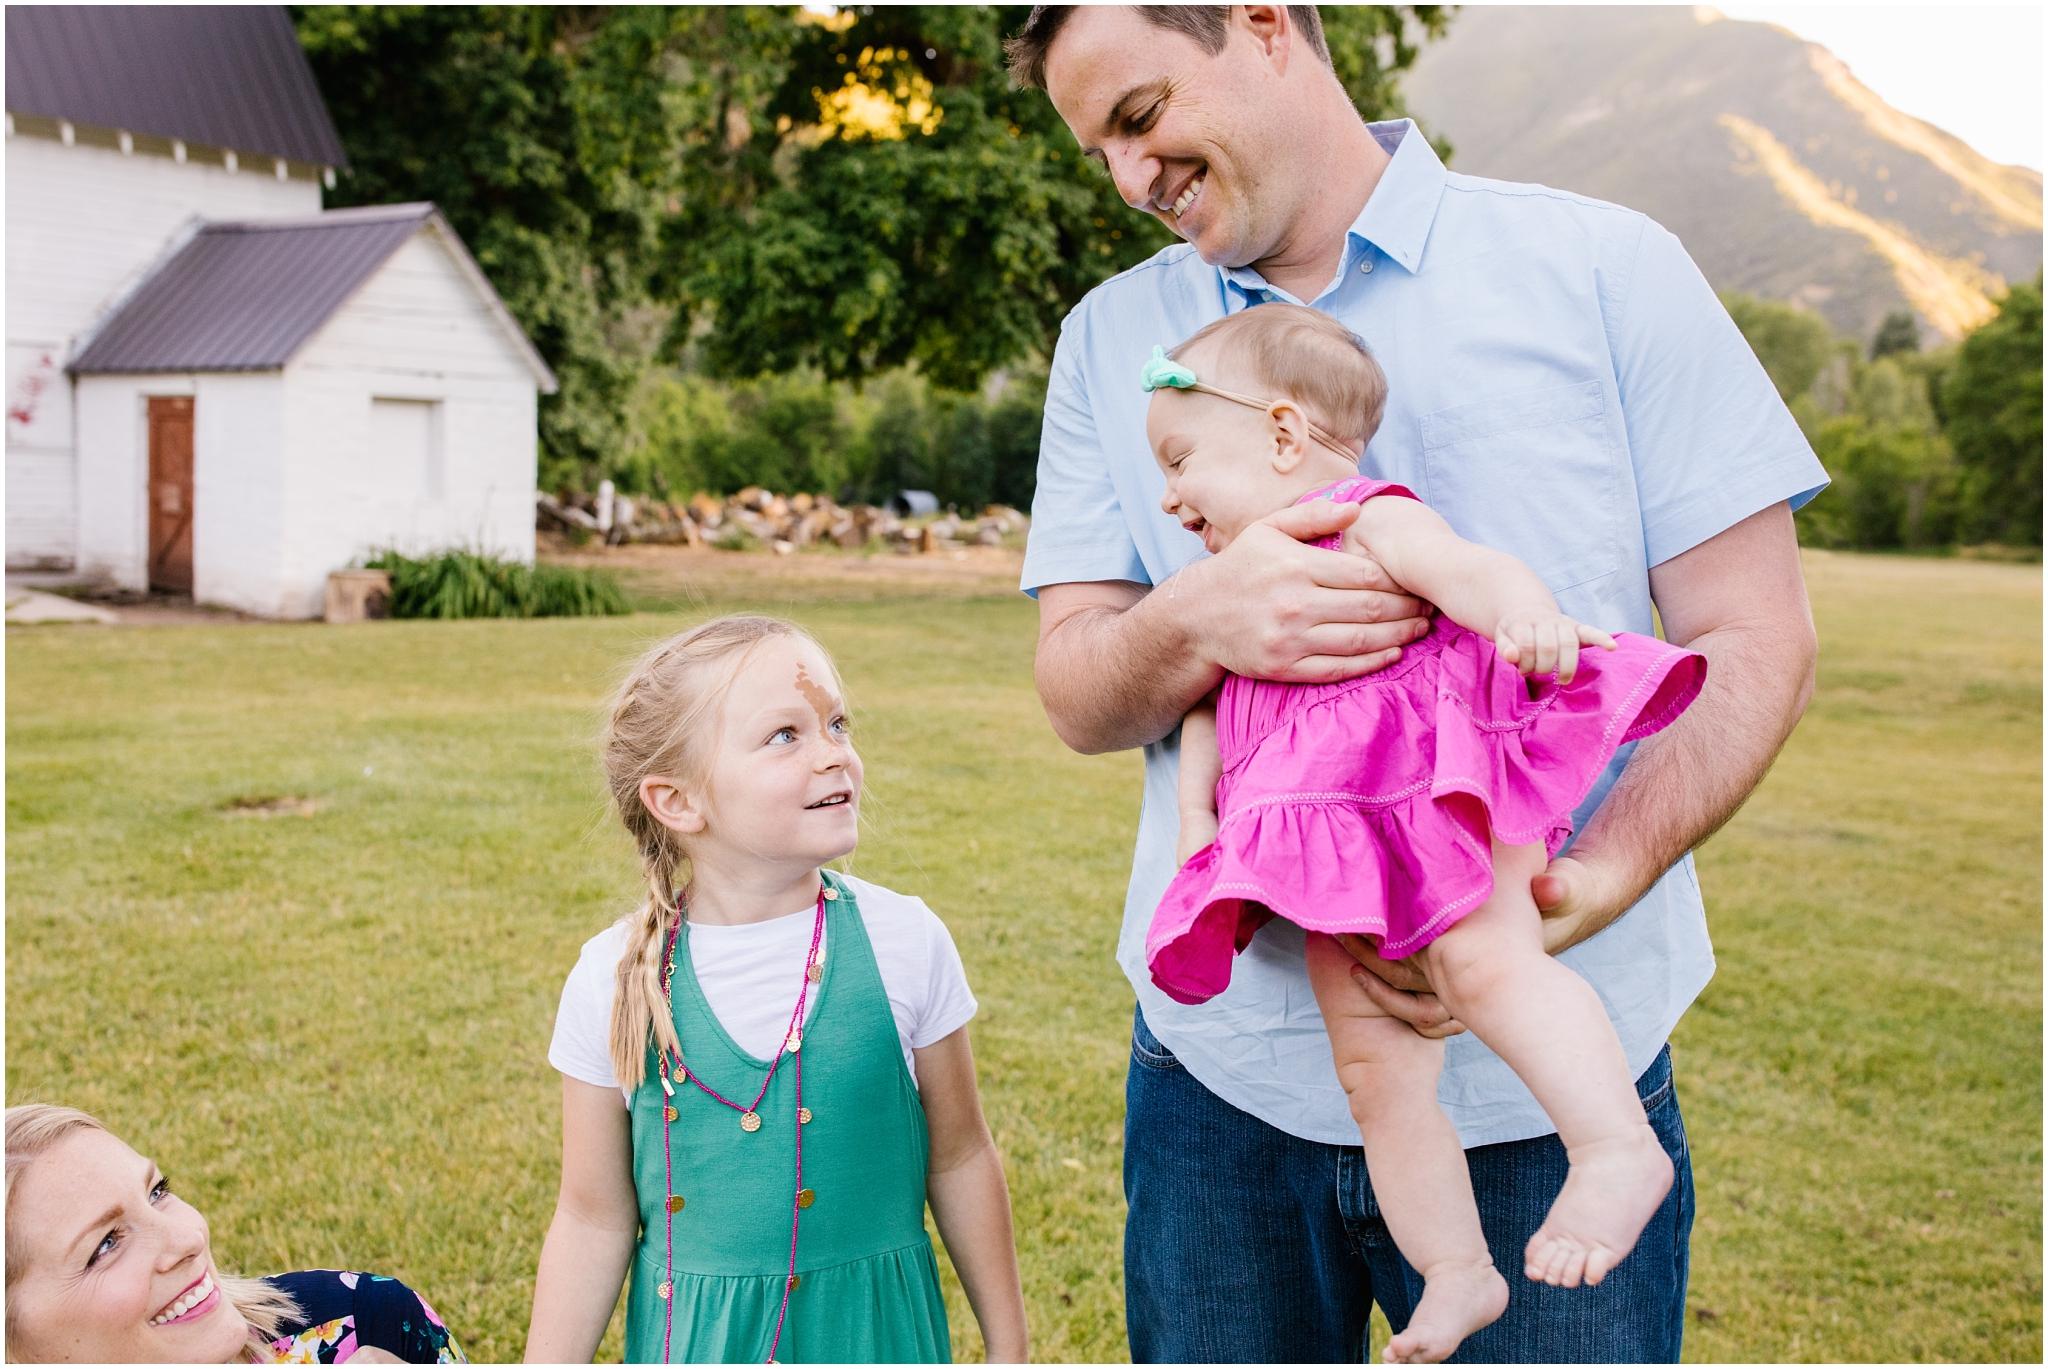 Lizzie-B-Imagery-Utah-Family-Photographer-Utah-County-Photographer-Hobble-Creek-Canyon_0017.jpg